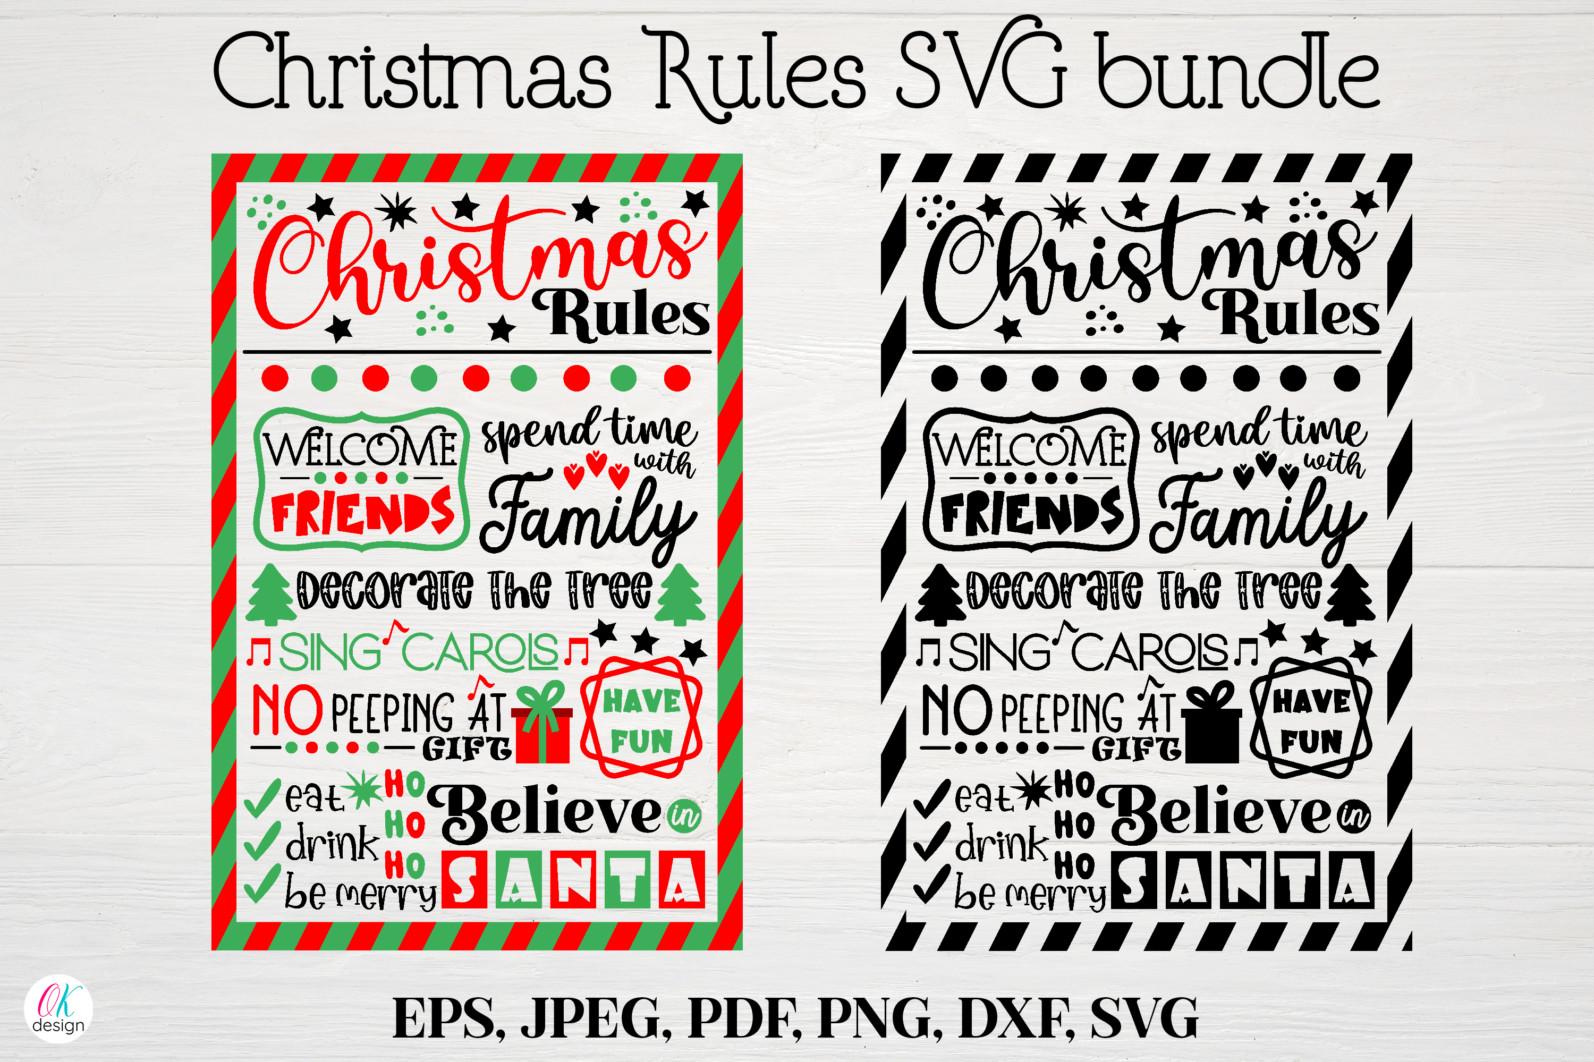 Christmas bundle Vol. 1. Christmas stickers. Christmas SVG bundle. - 25 Christmas svg Christmas rules SVG Christmas sign svg Christmas rules bundle Christmas house rules svg Christmas poster svg Winter svg Christmas decor scaled -